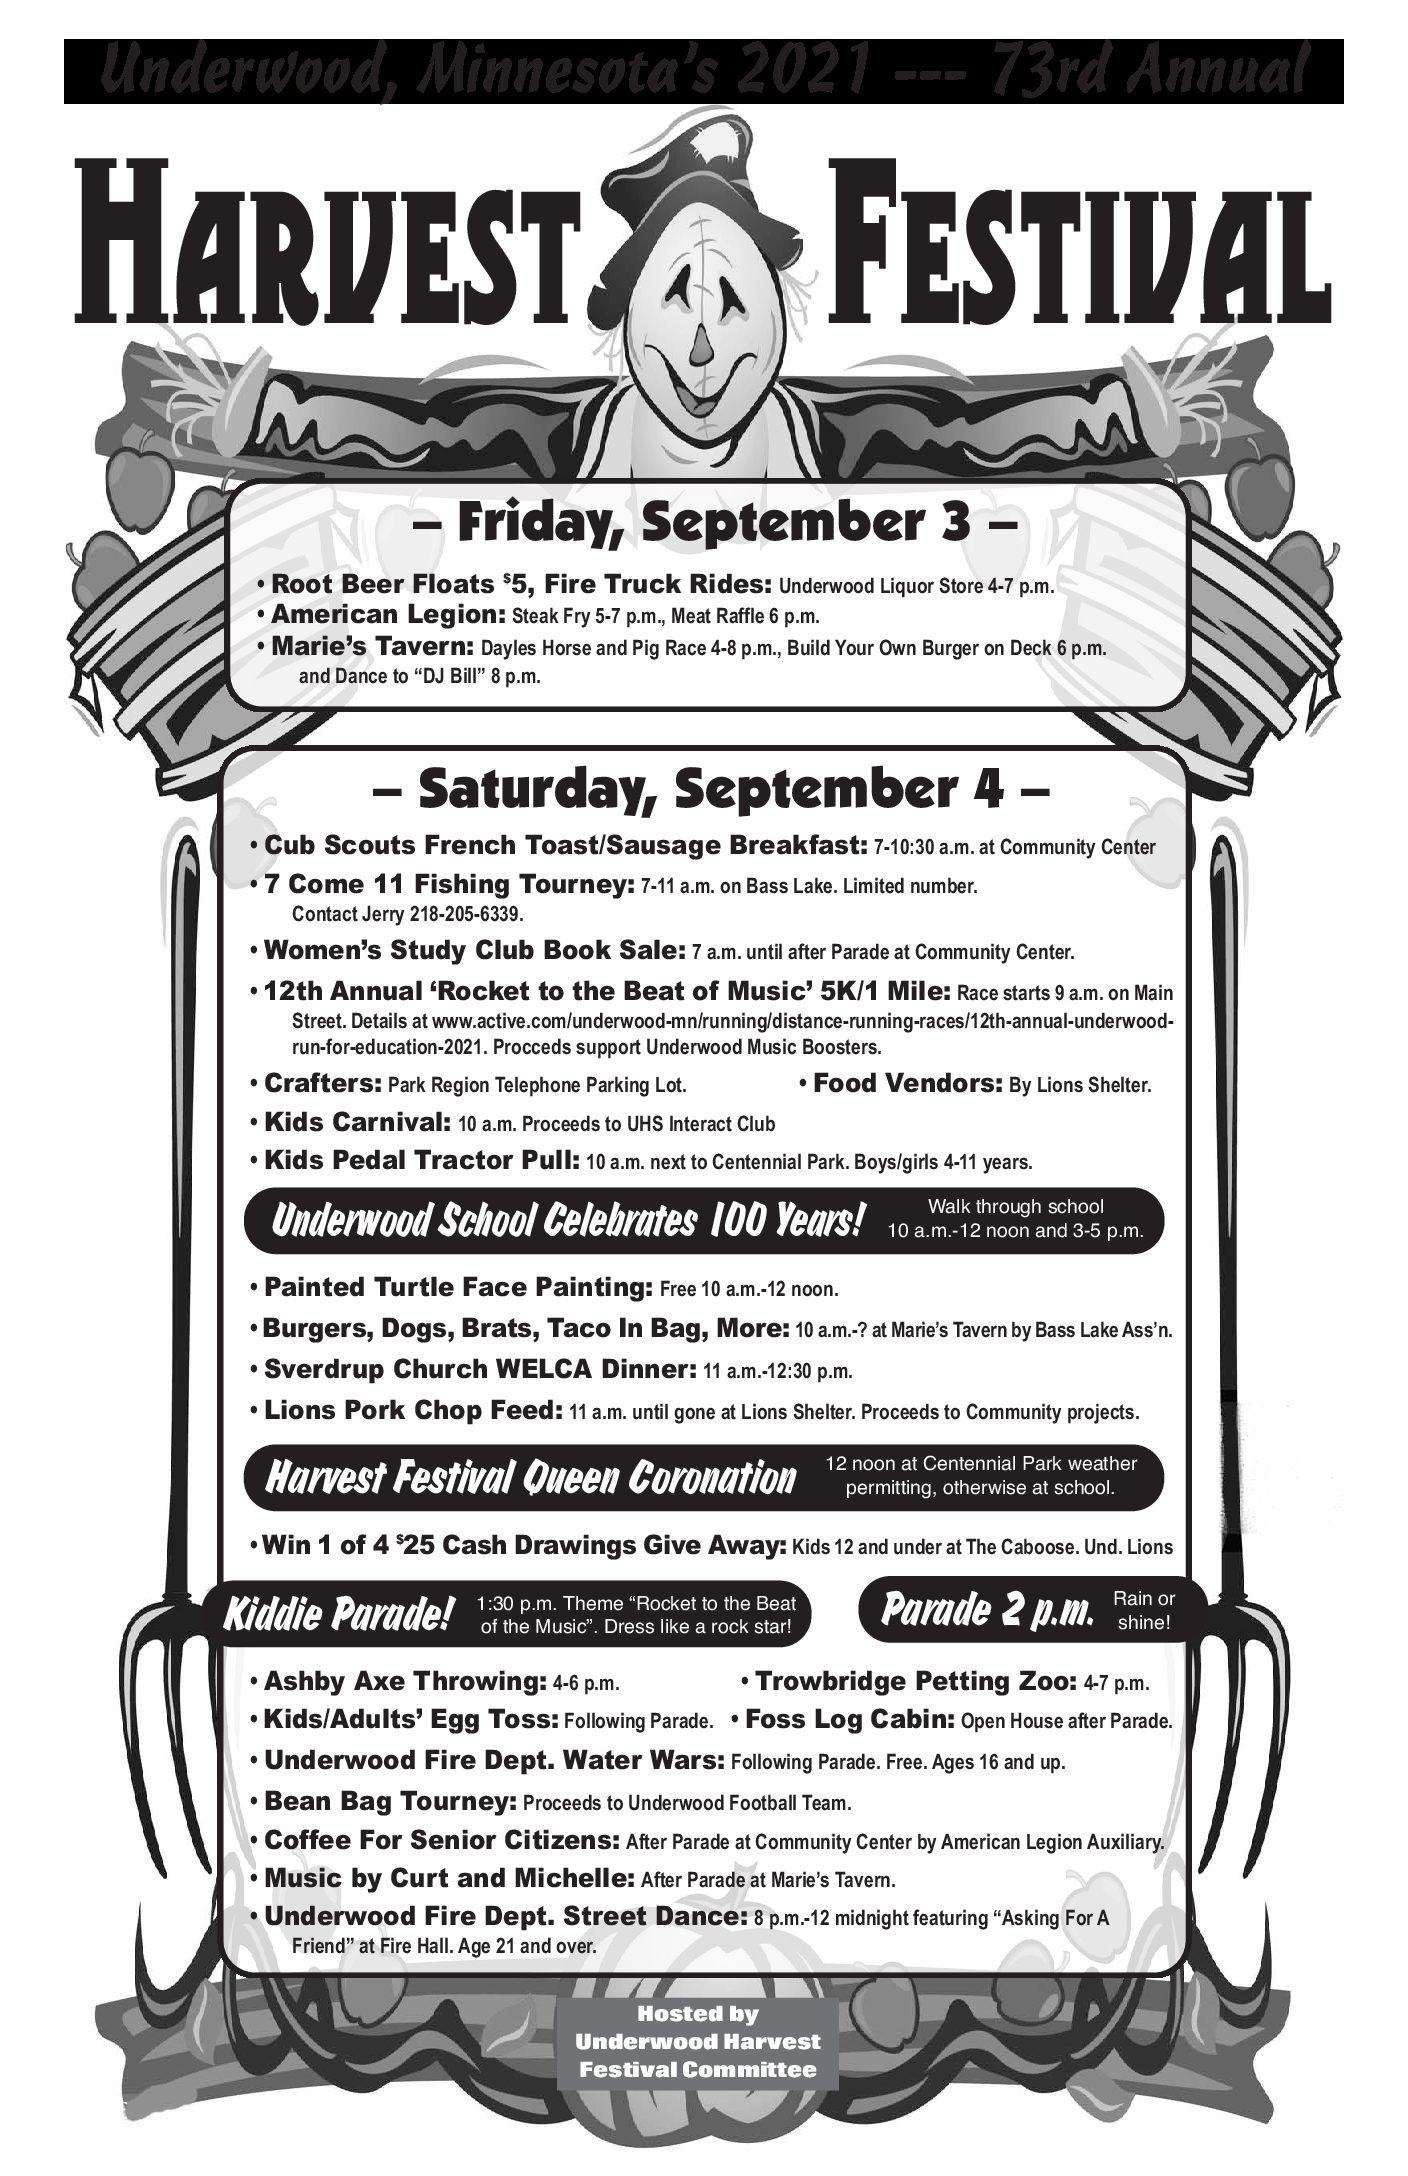 Underwood 73rd Harvest Festival